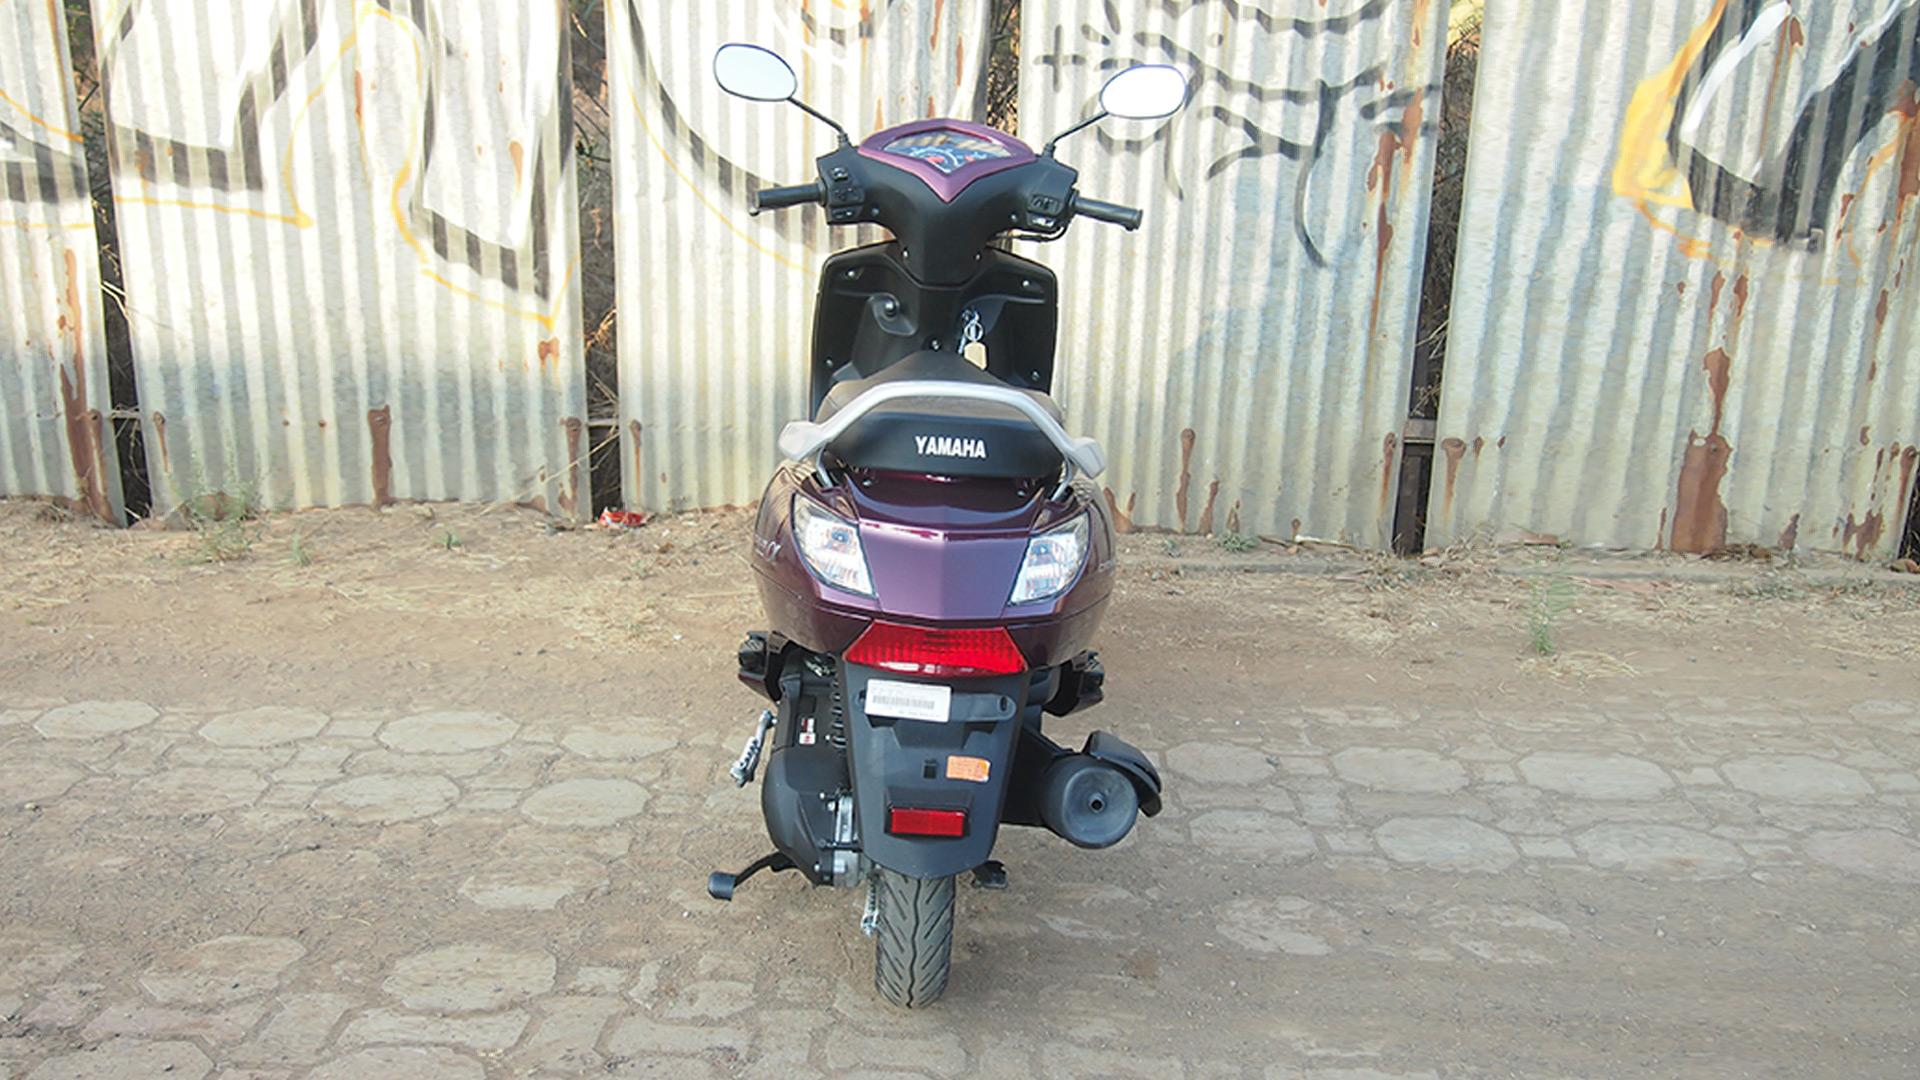 Yamaha Alpha Scooter 2014 STD Compare